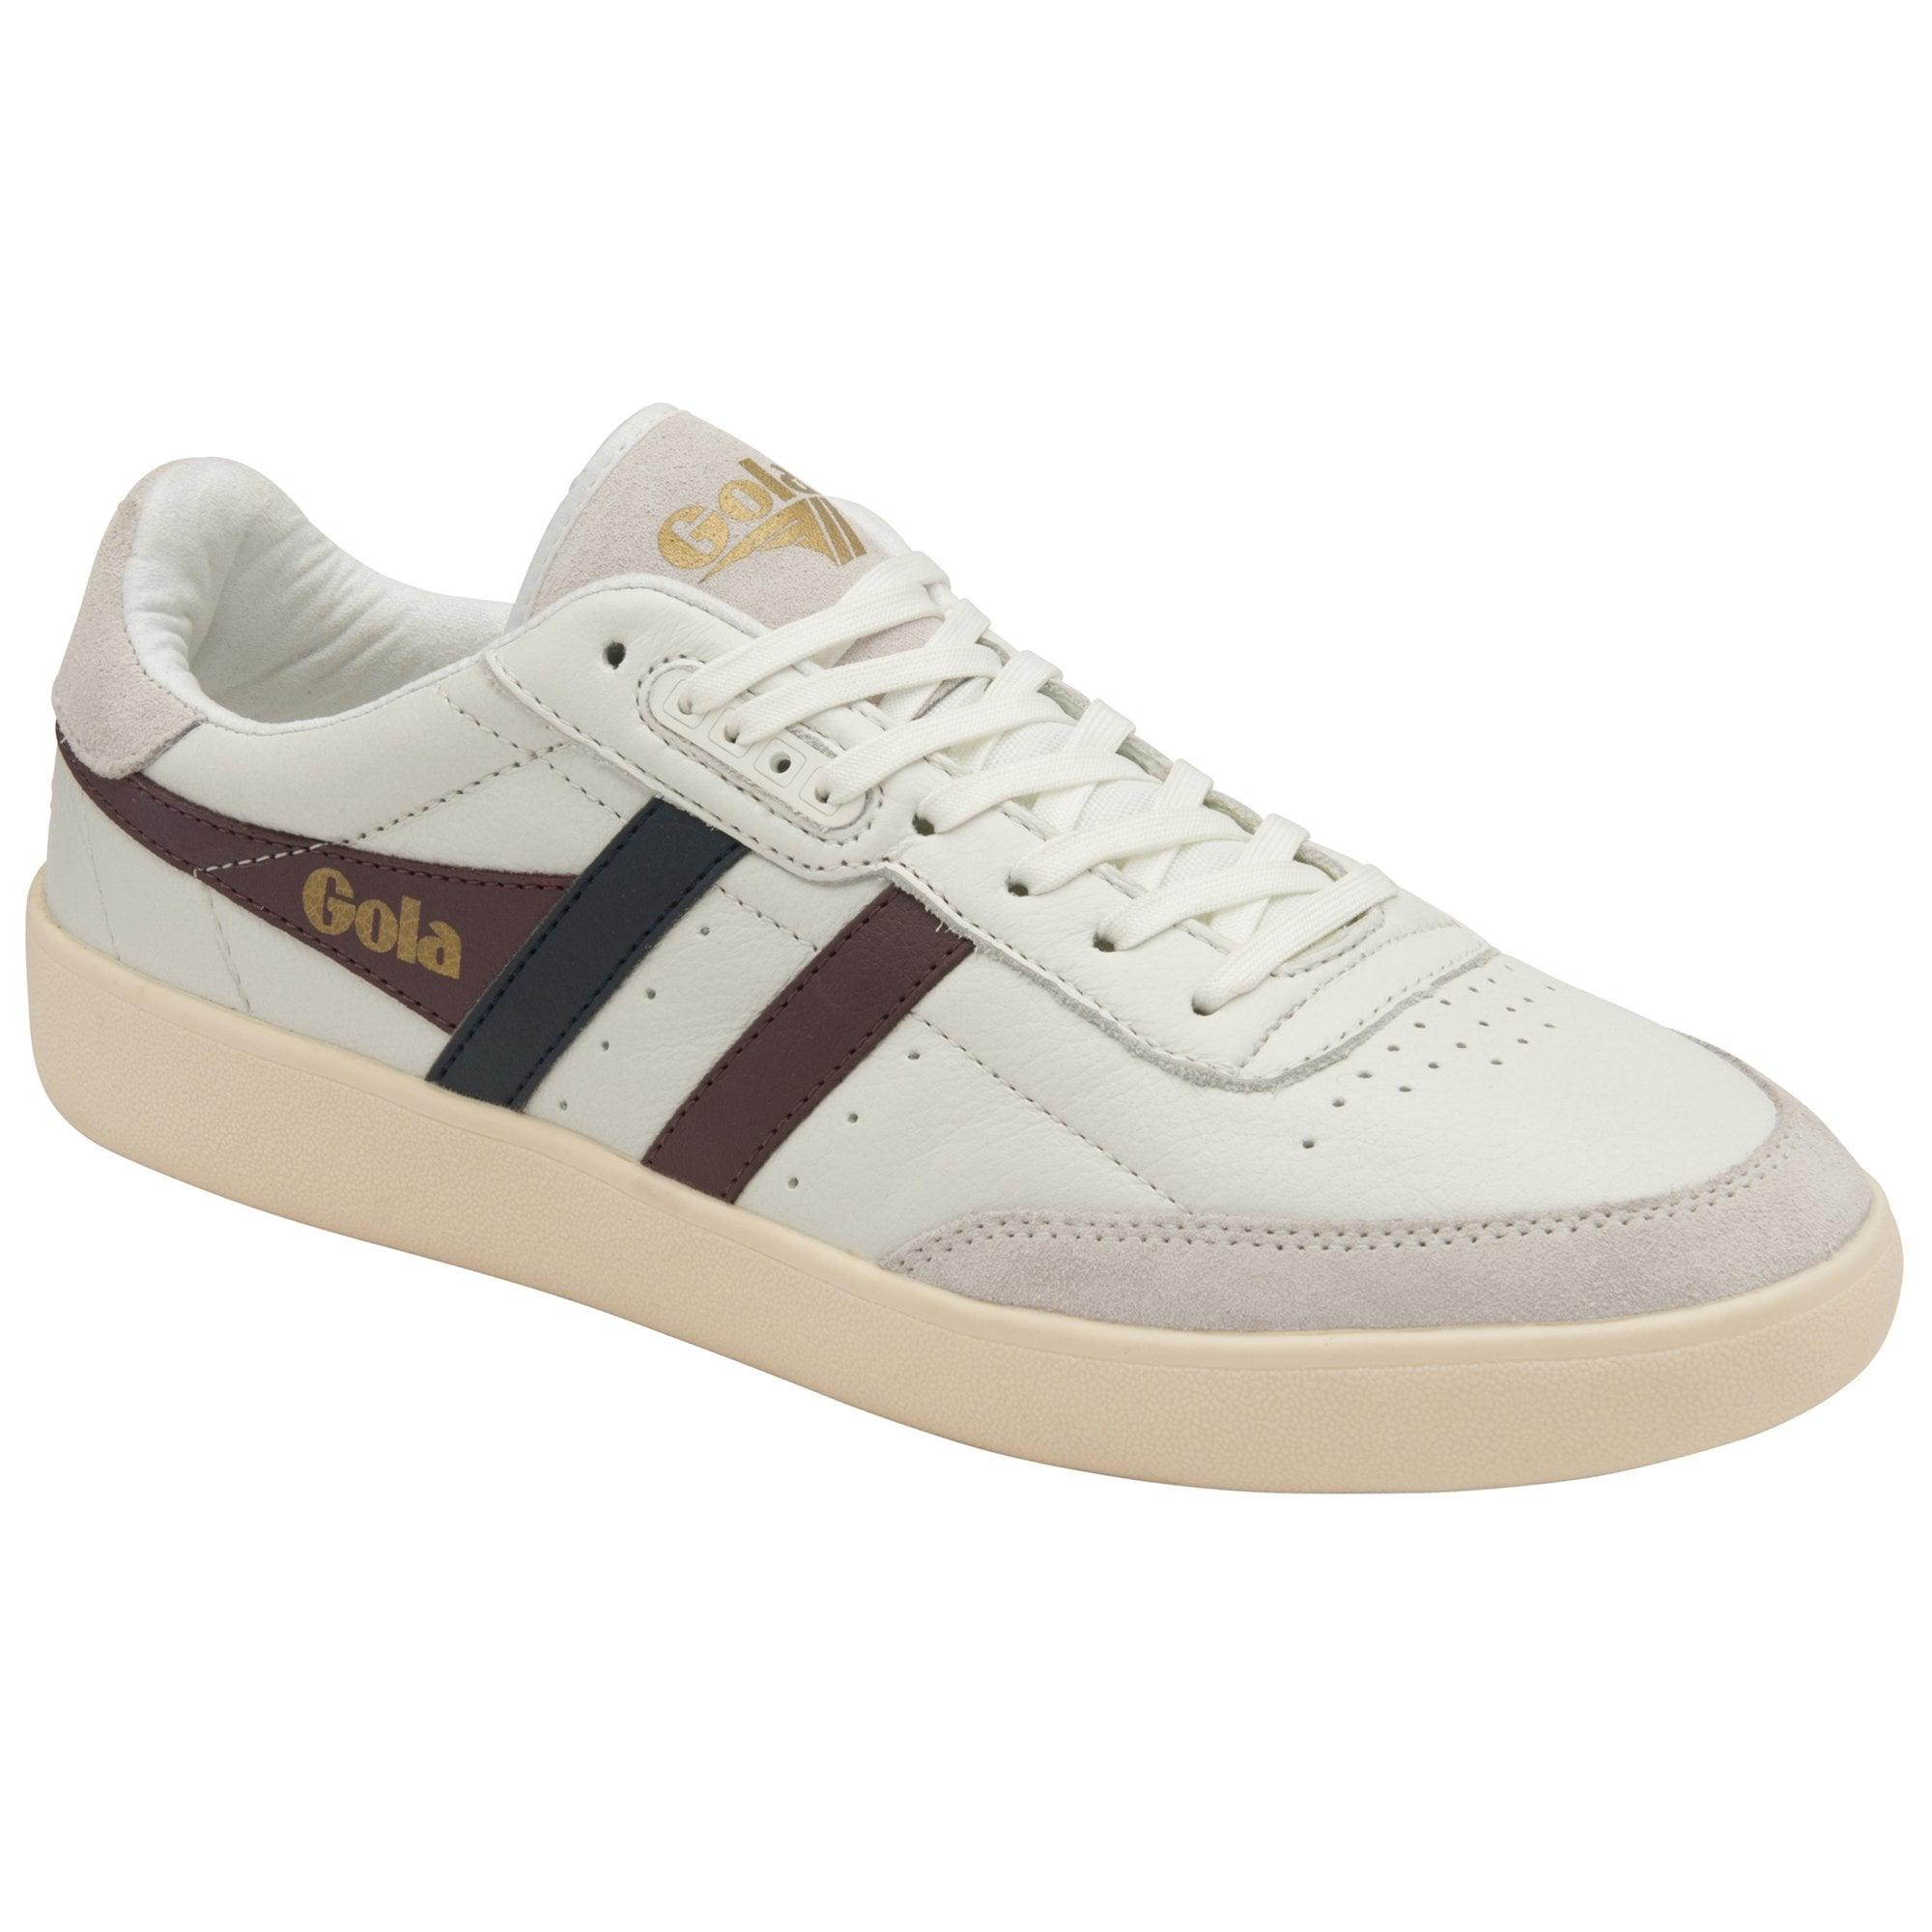 Buy Gola mens Inca Leather white